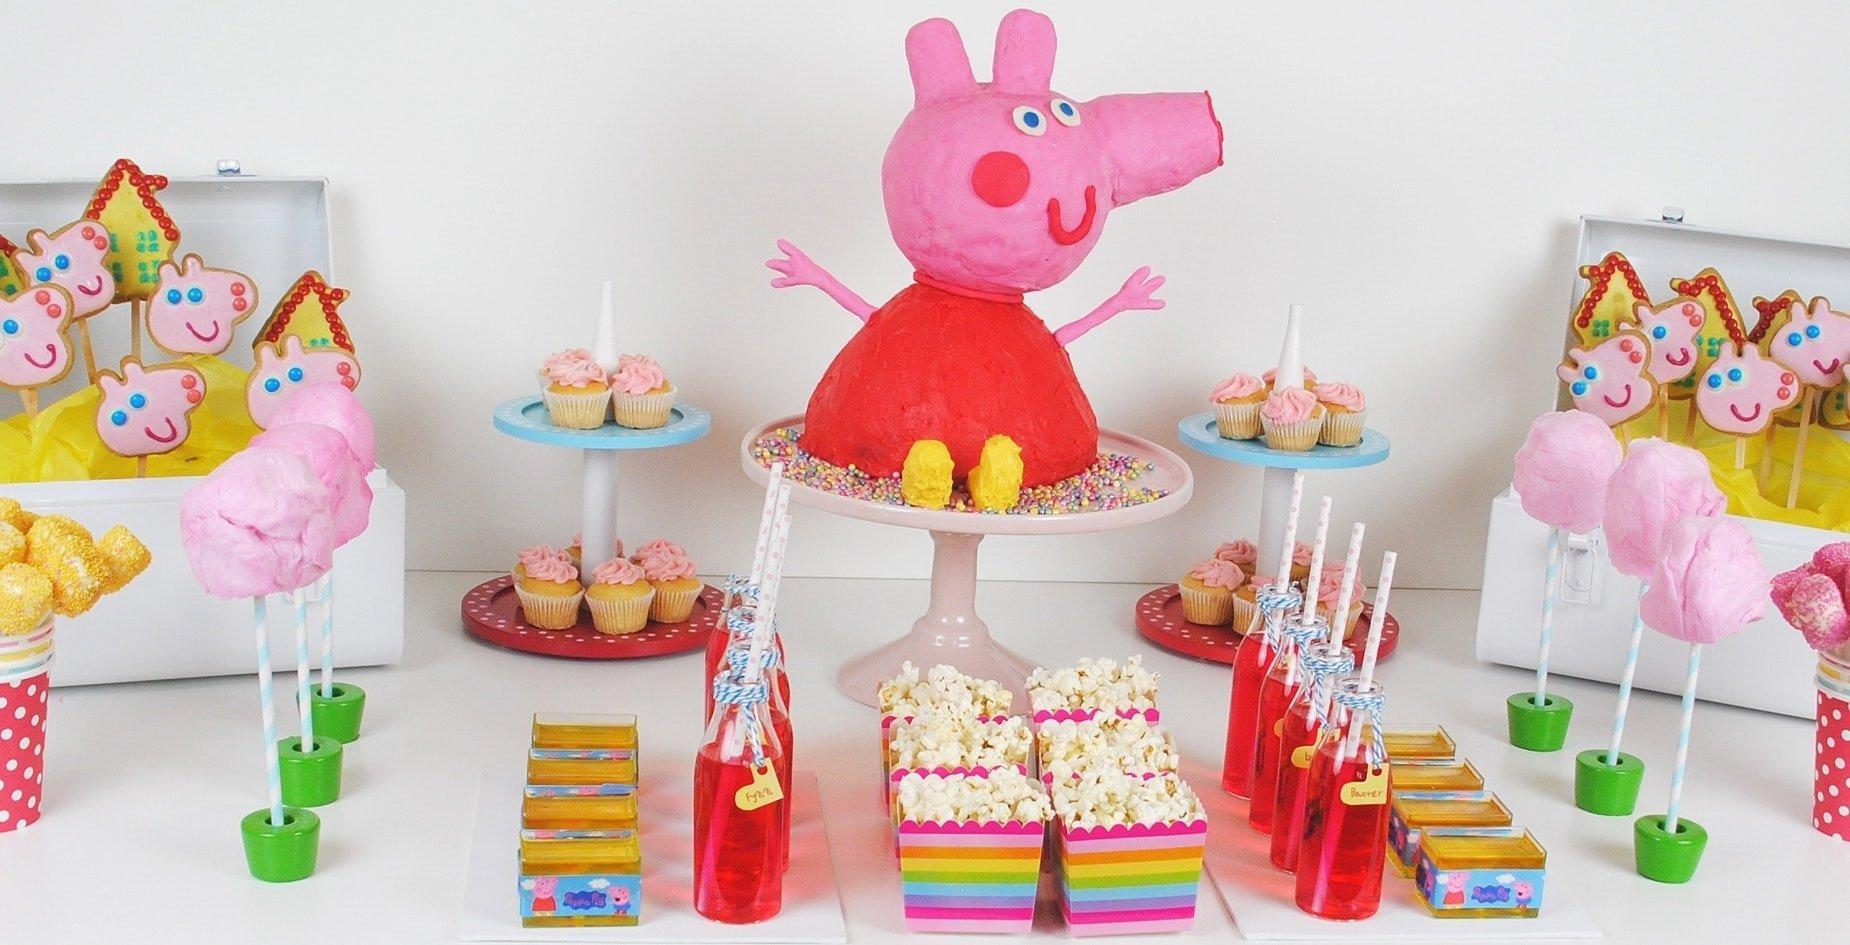 10 Unique Peppa Pig Birthday Party Ideas peppa pig birthday party decorations assorted ideas sandy wonderful 2021